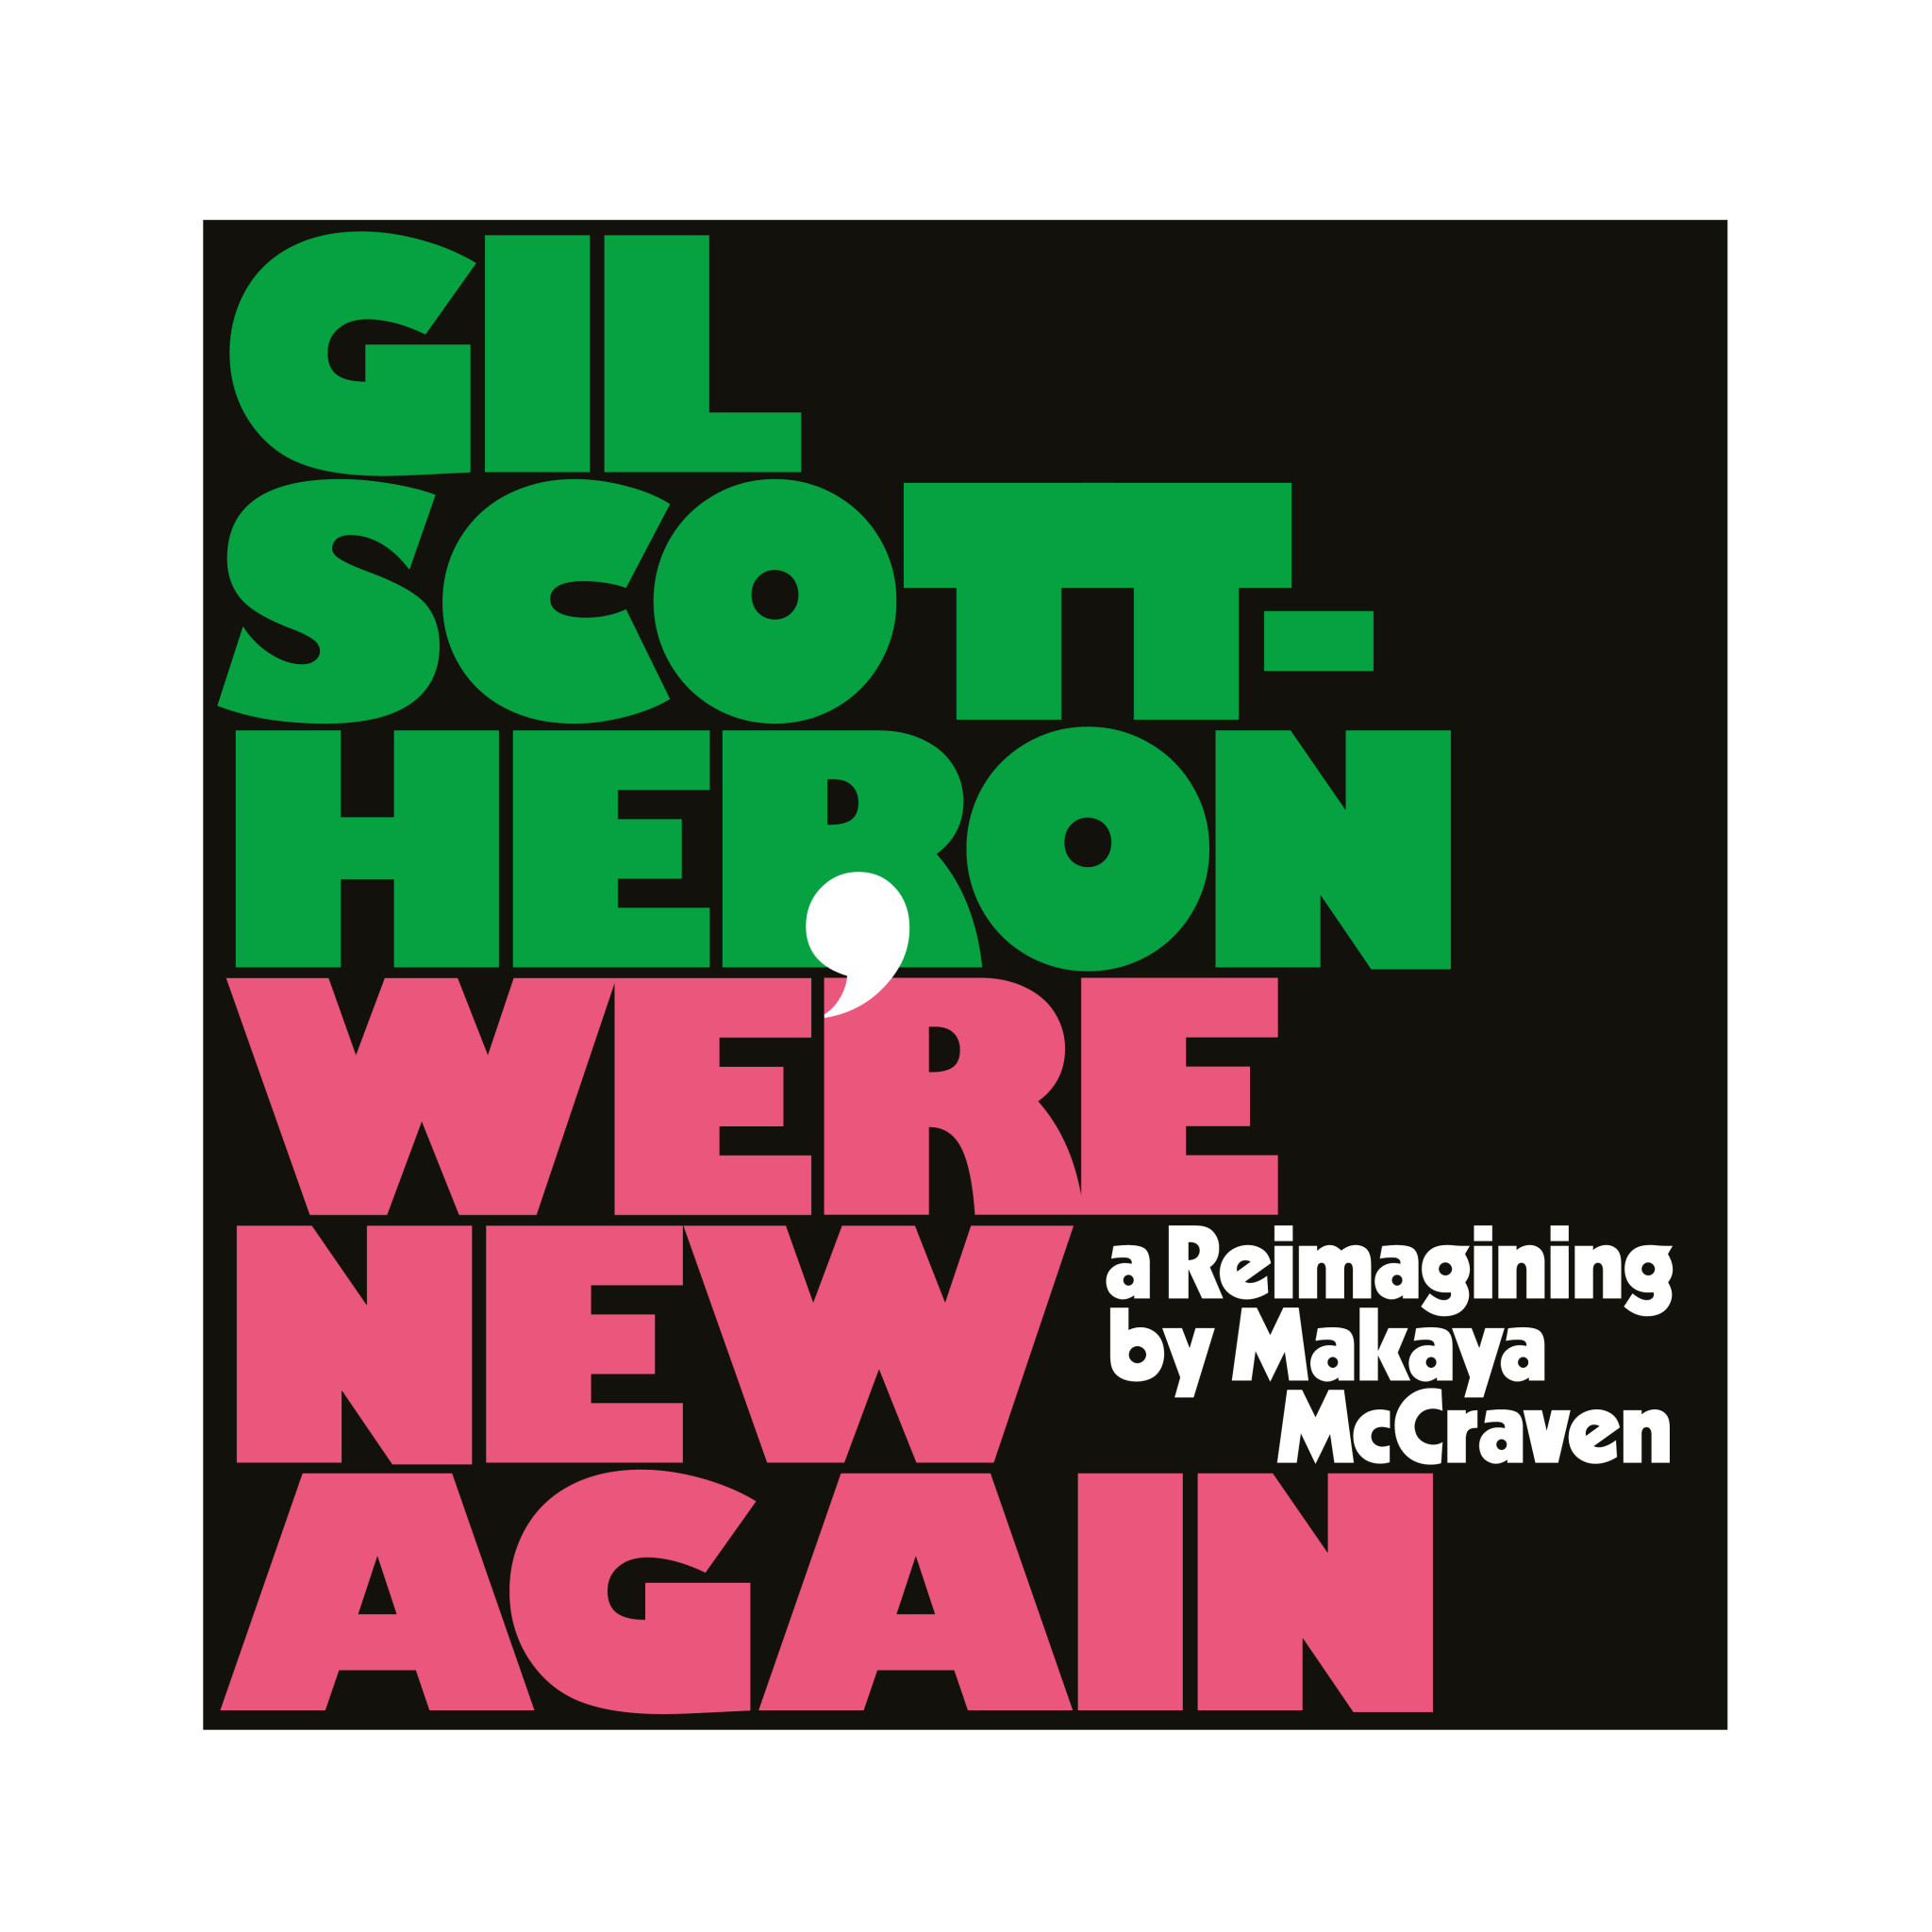 XL Recordings Gil Scott-Heron & Makaya McCraven - We're New Again: A Re-imagining by Makaya McCraven